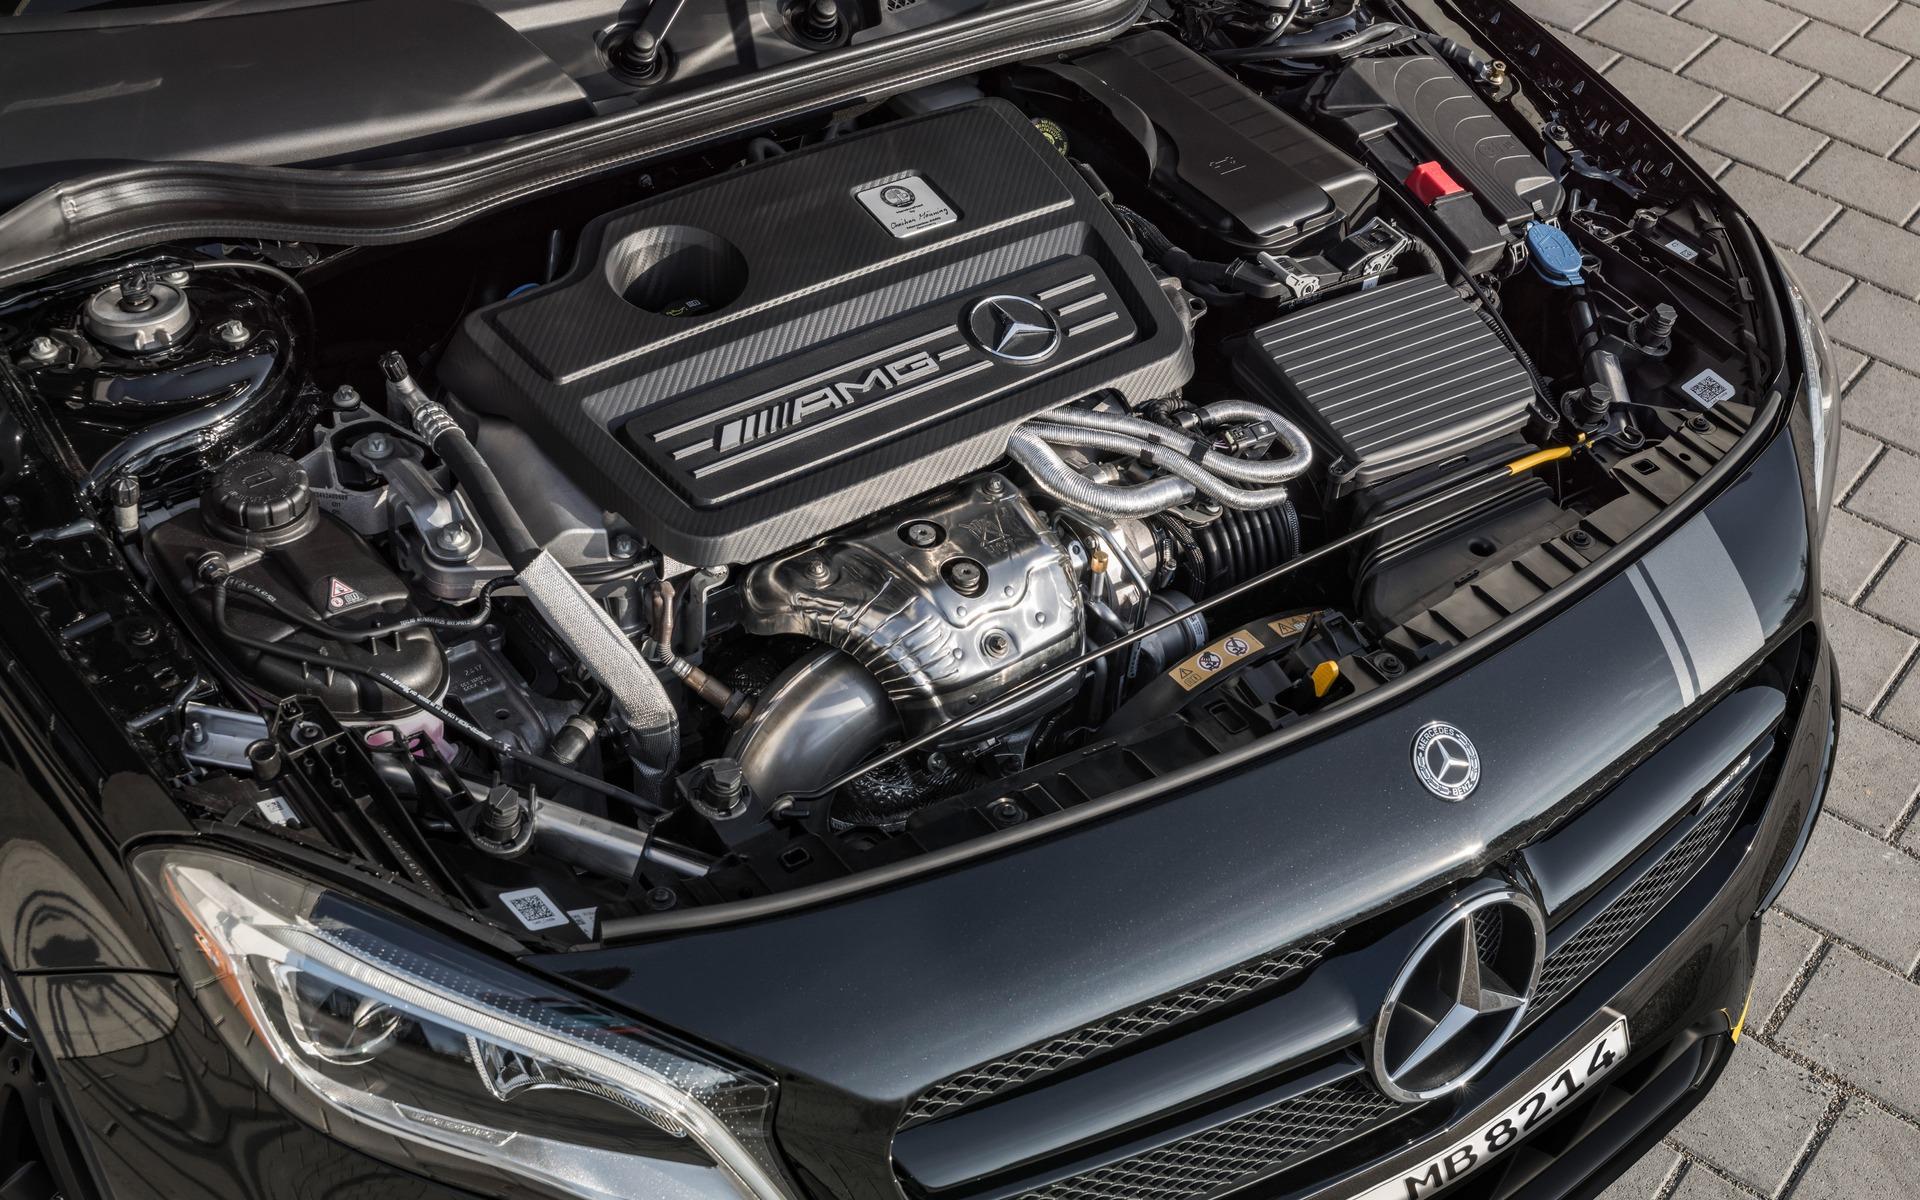 <p>Mercedes-AMG GLA 45 4MATIC 2018 avec l'ensemble Studio Performance.</p>